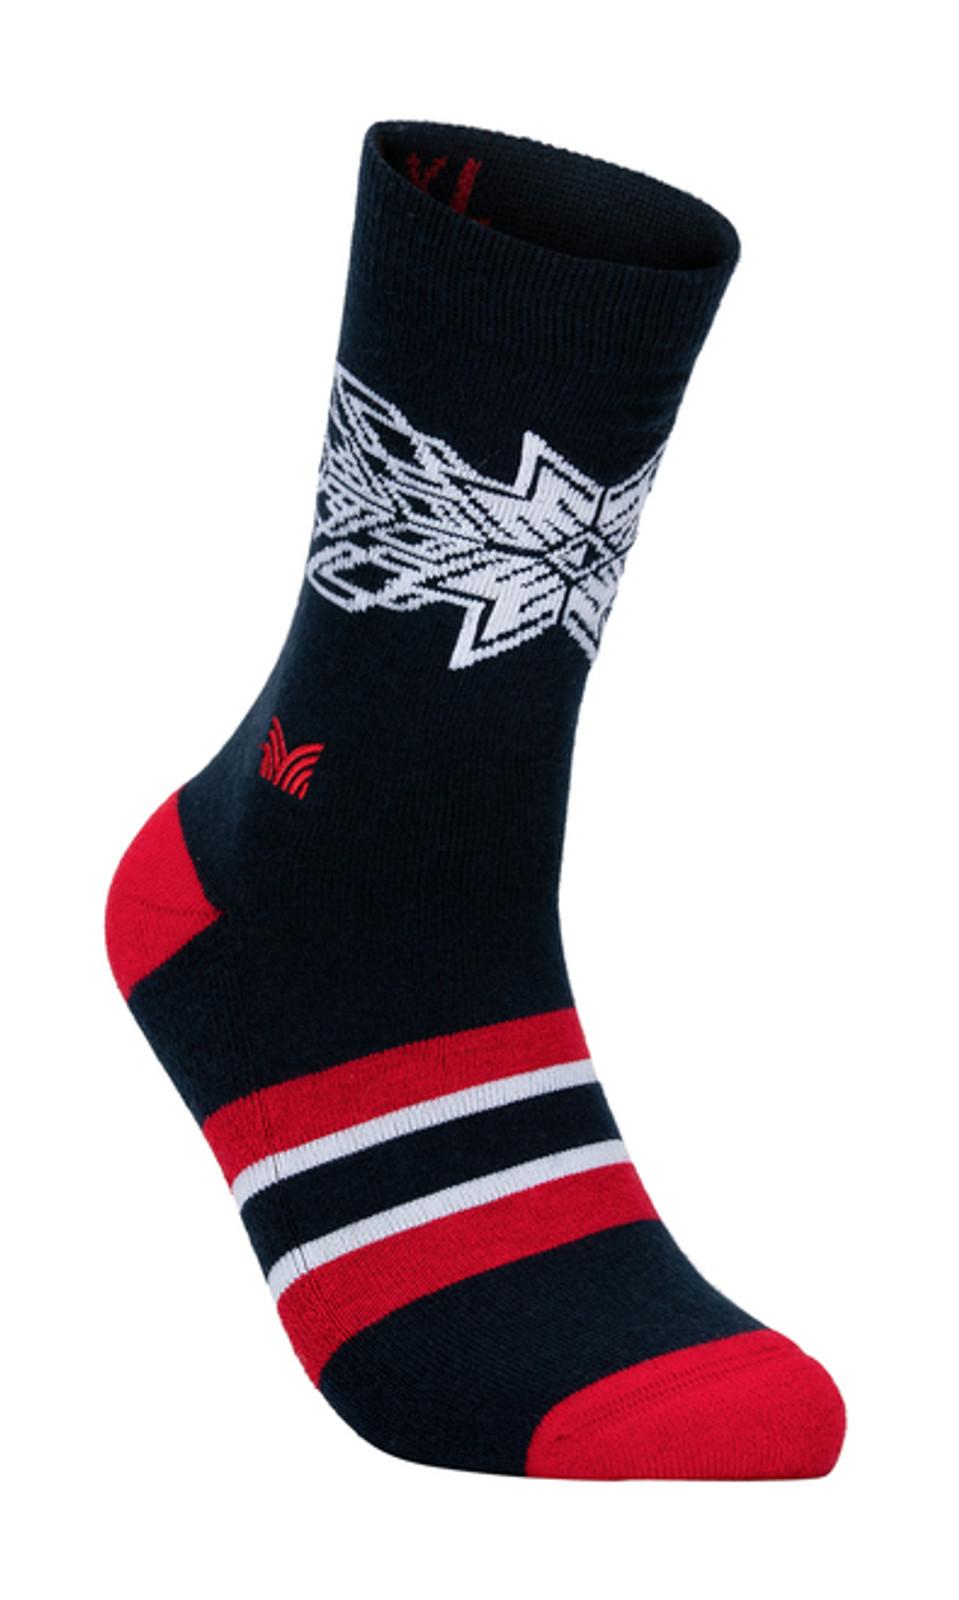 Dale of Norway OL Spirit Sock, Navy/Raspberry/Off White, 50121C